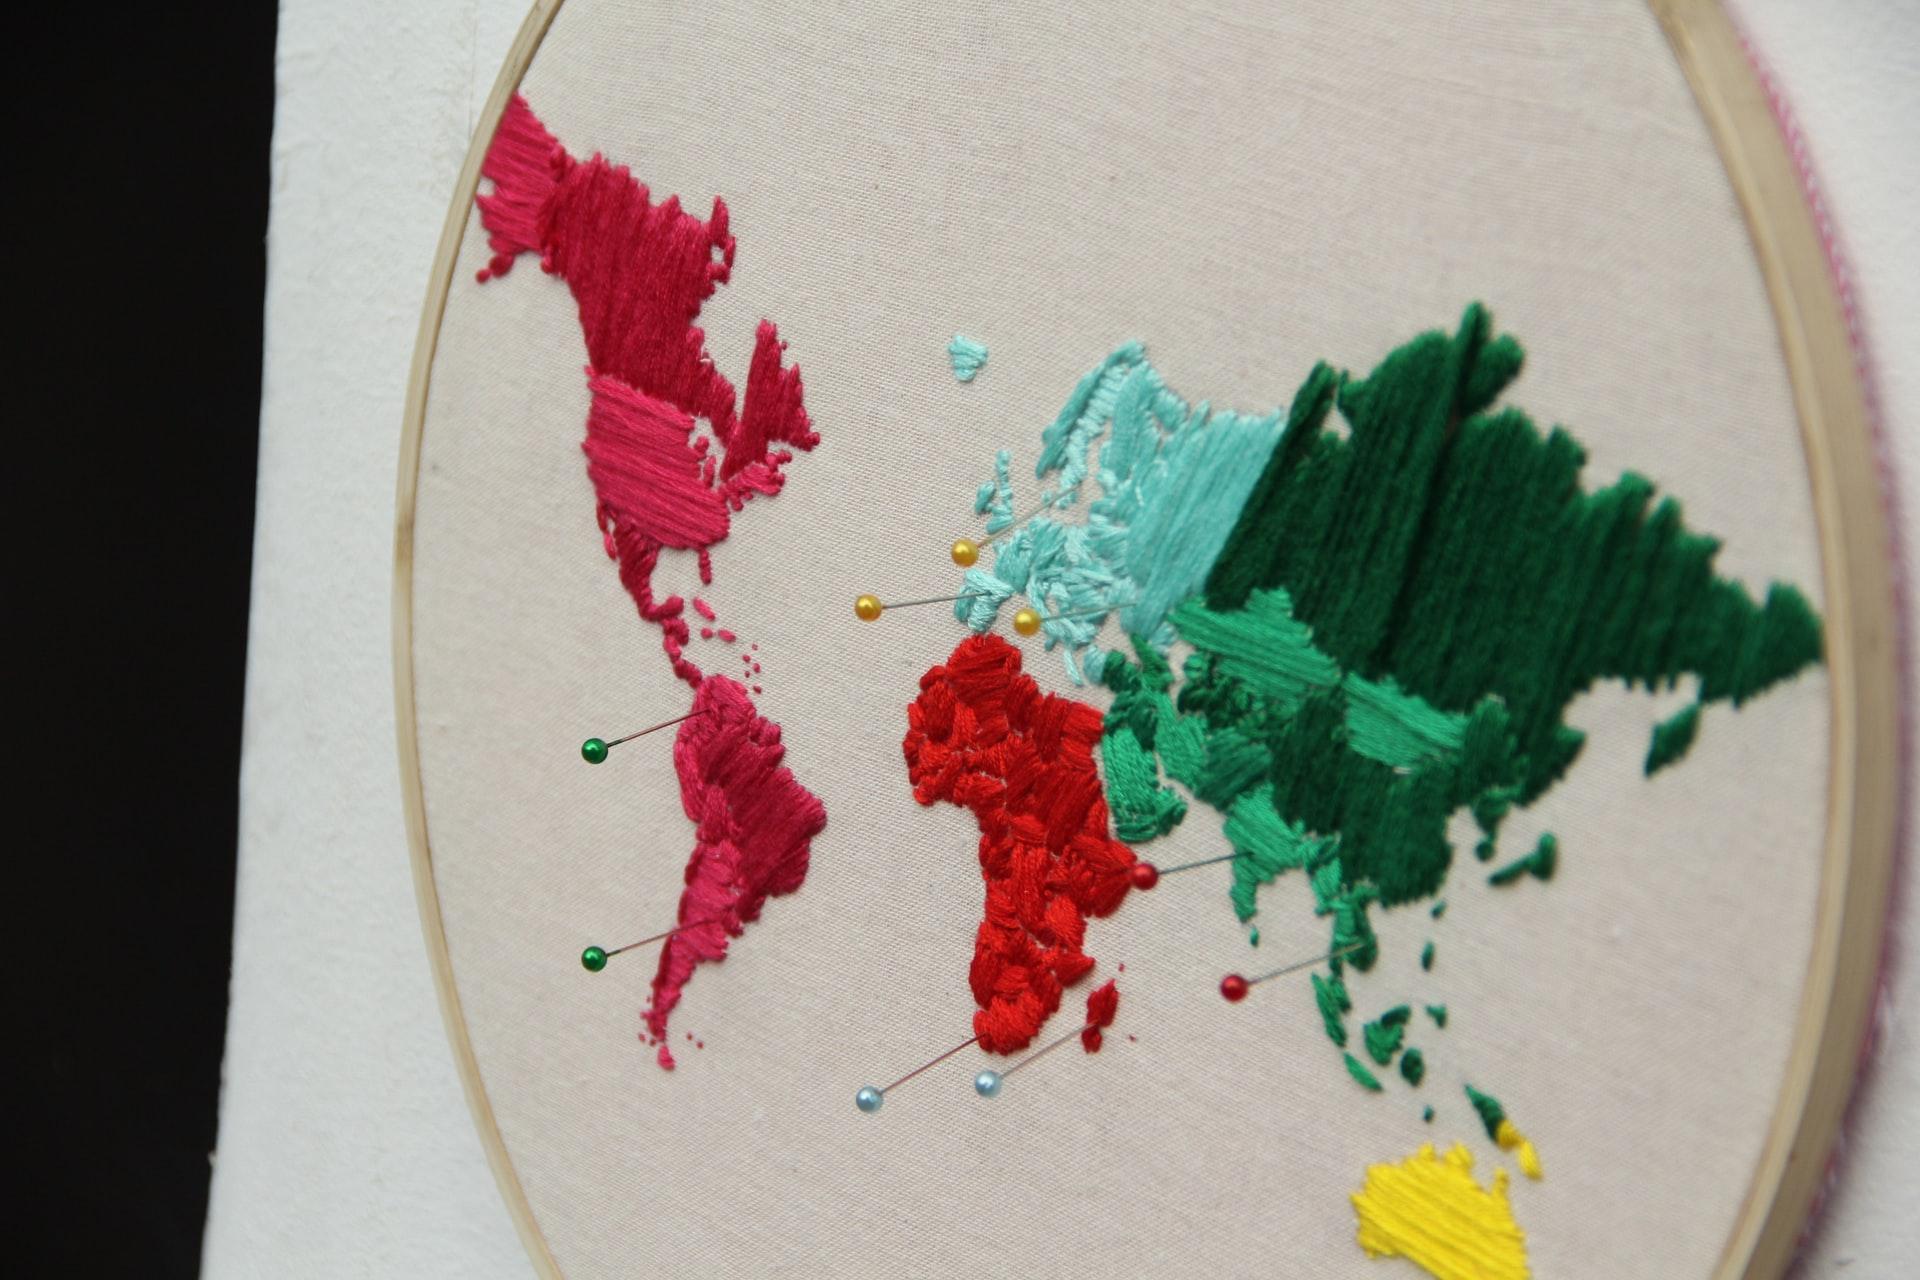 Como funciona o curso de bordado online da Domestika?